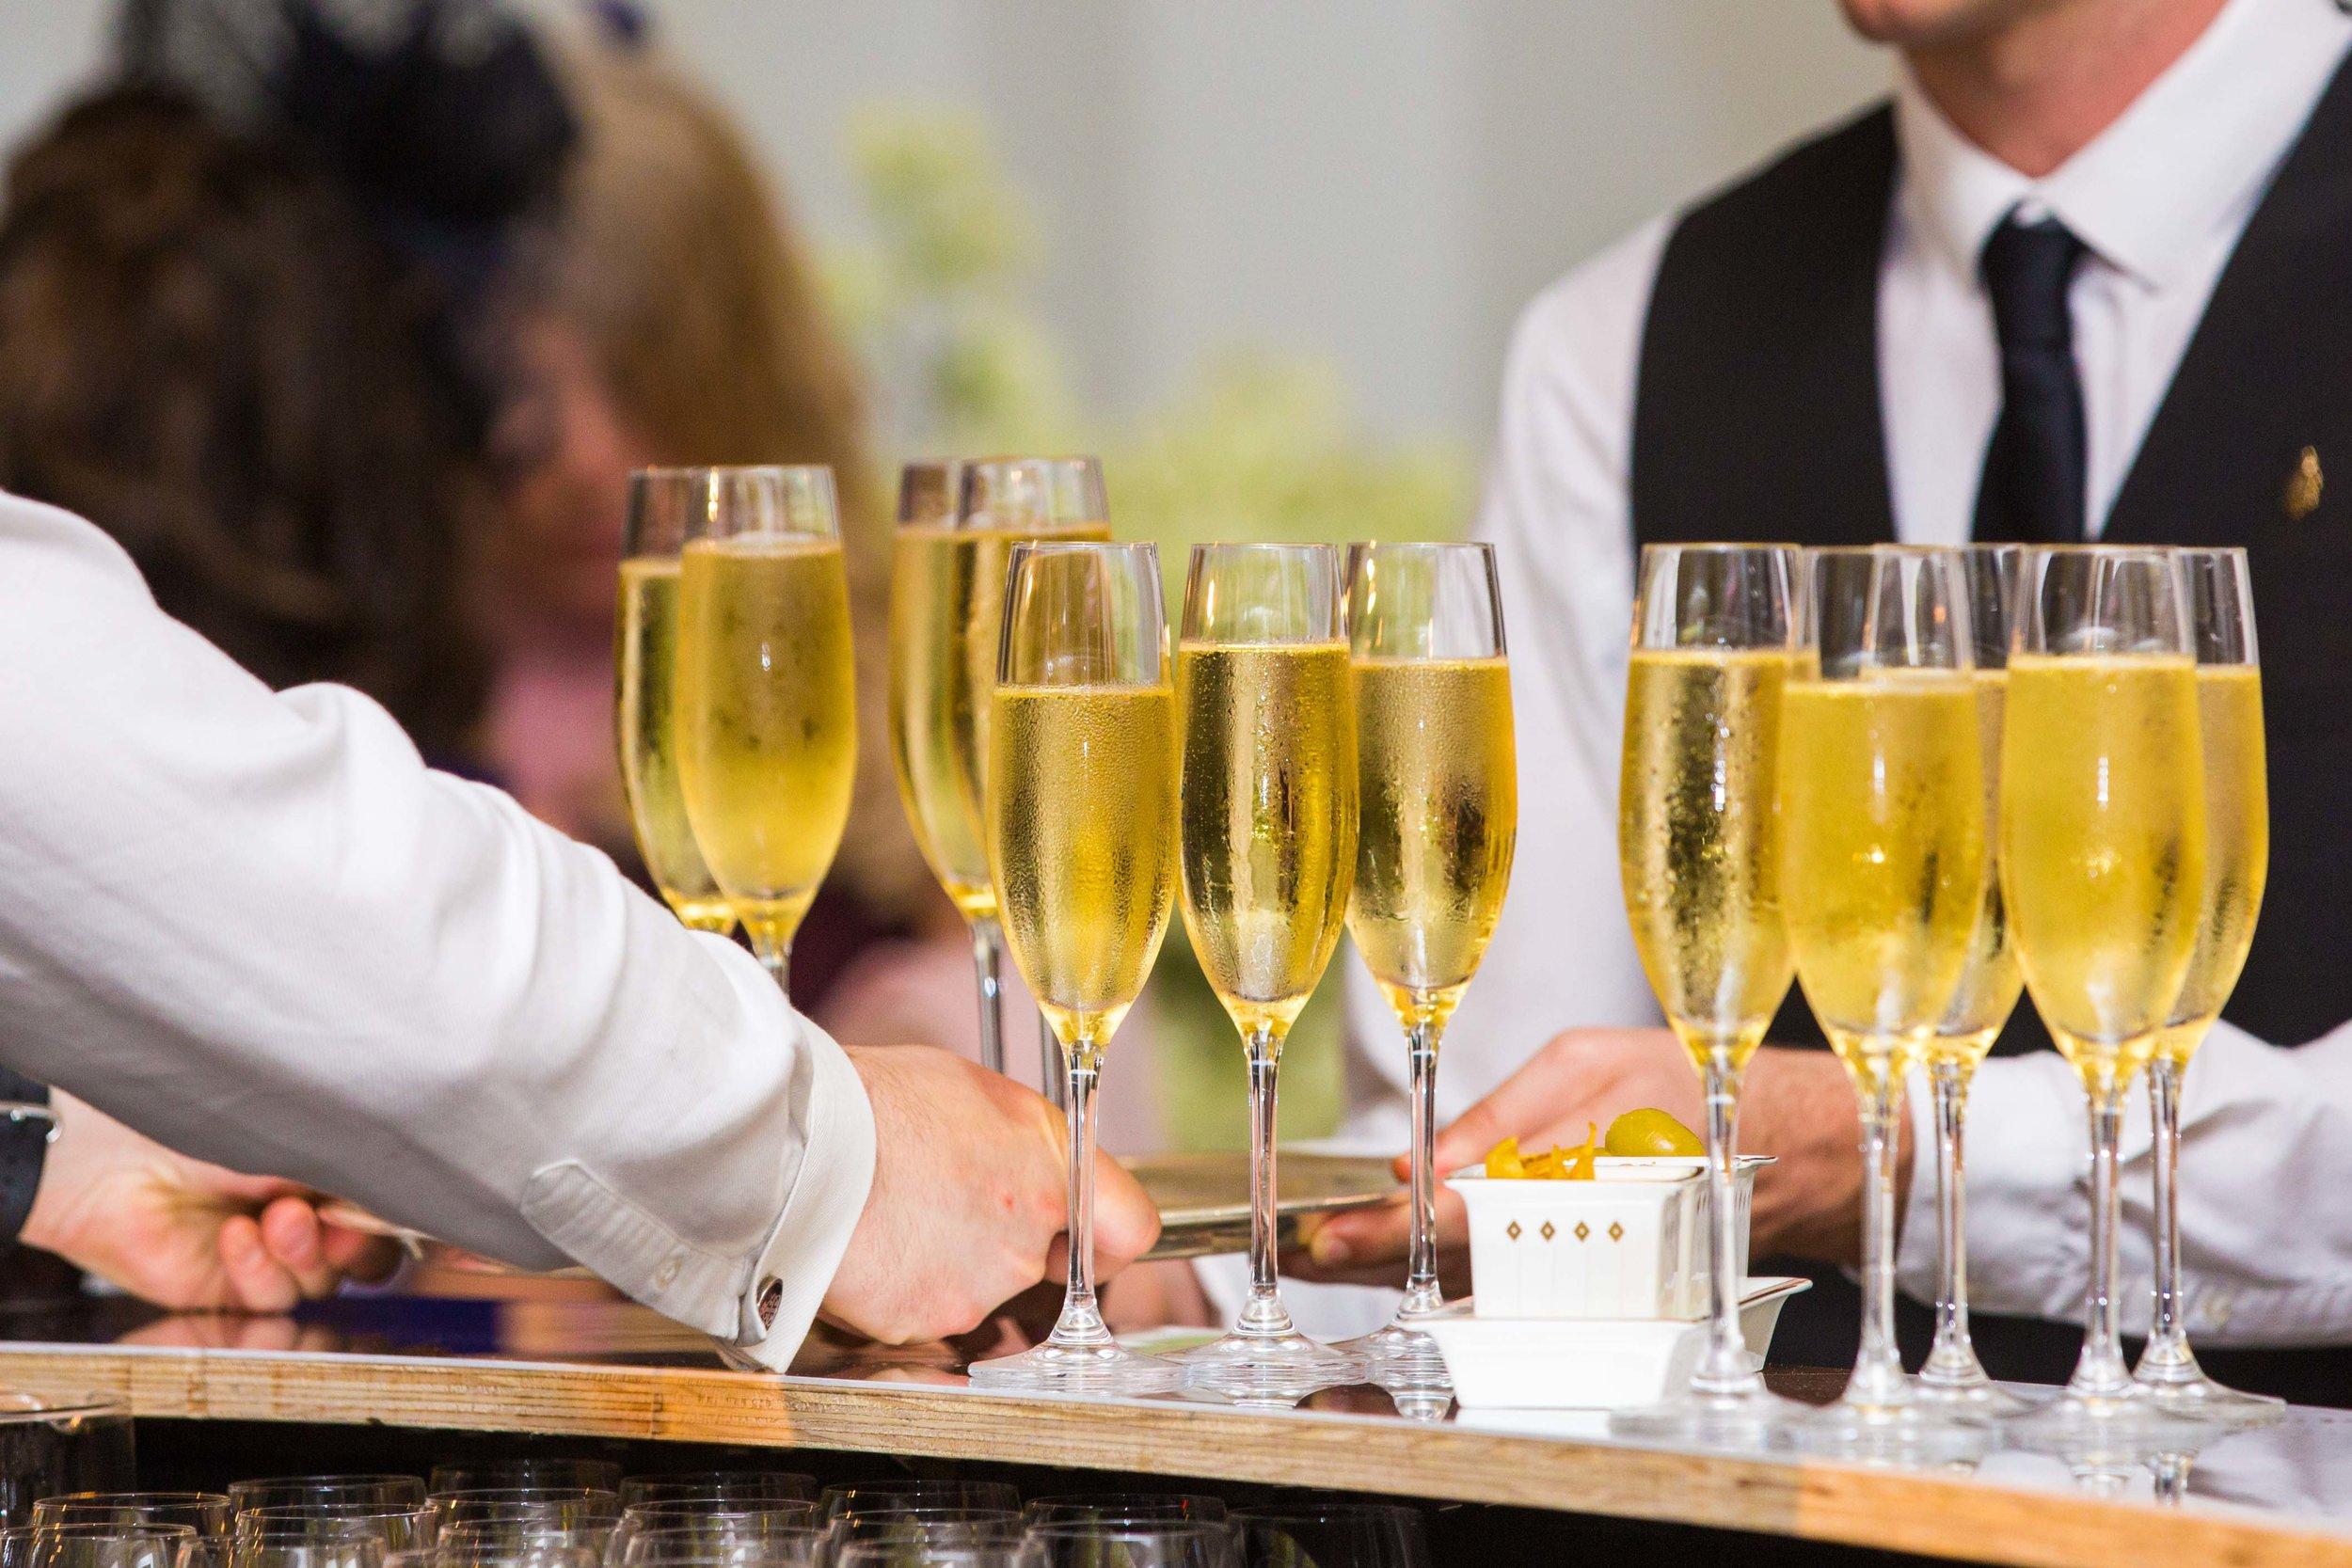 claridges-hotel-wedding-photographer-london-mayfair-natalia-smith-photography-86.jpg